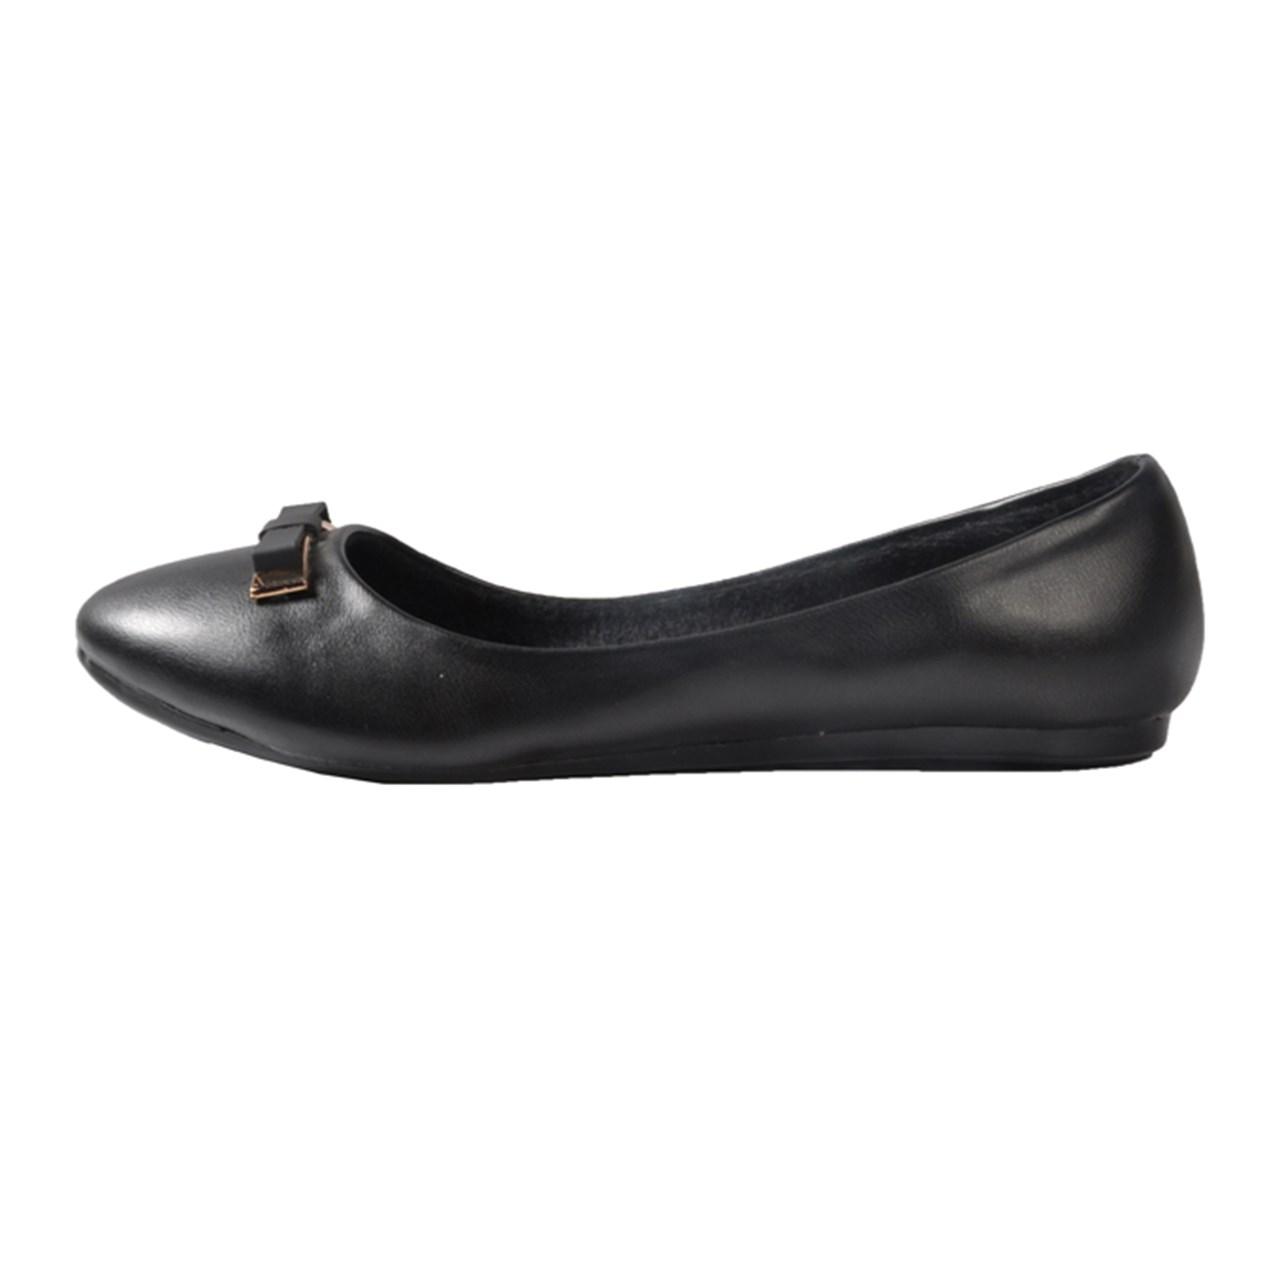 خرید کفش چرم زنانه مهاجر مدل M32m